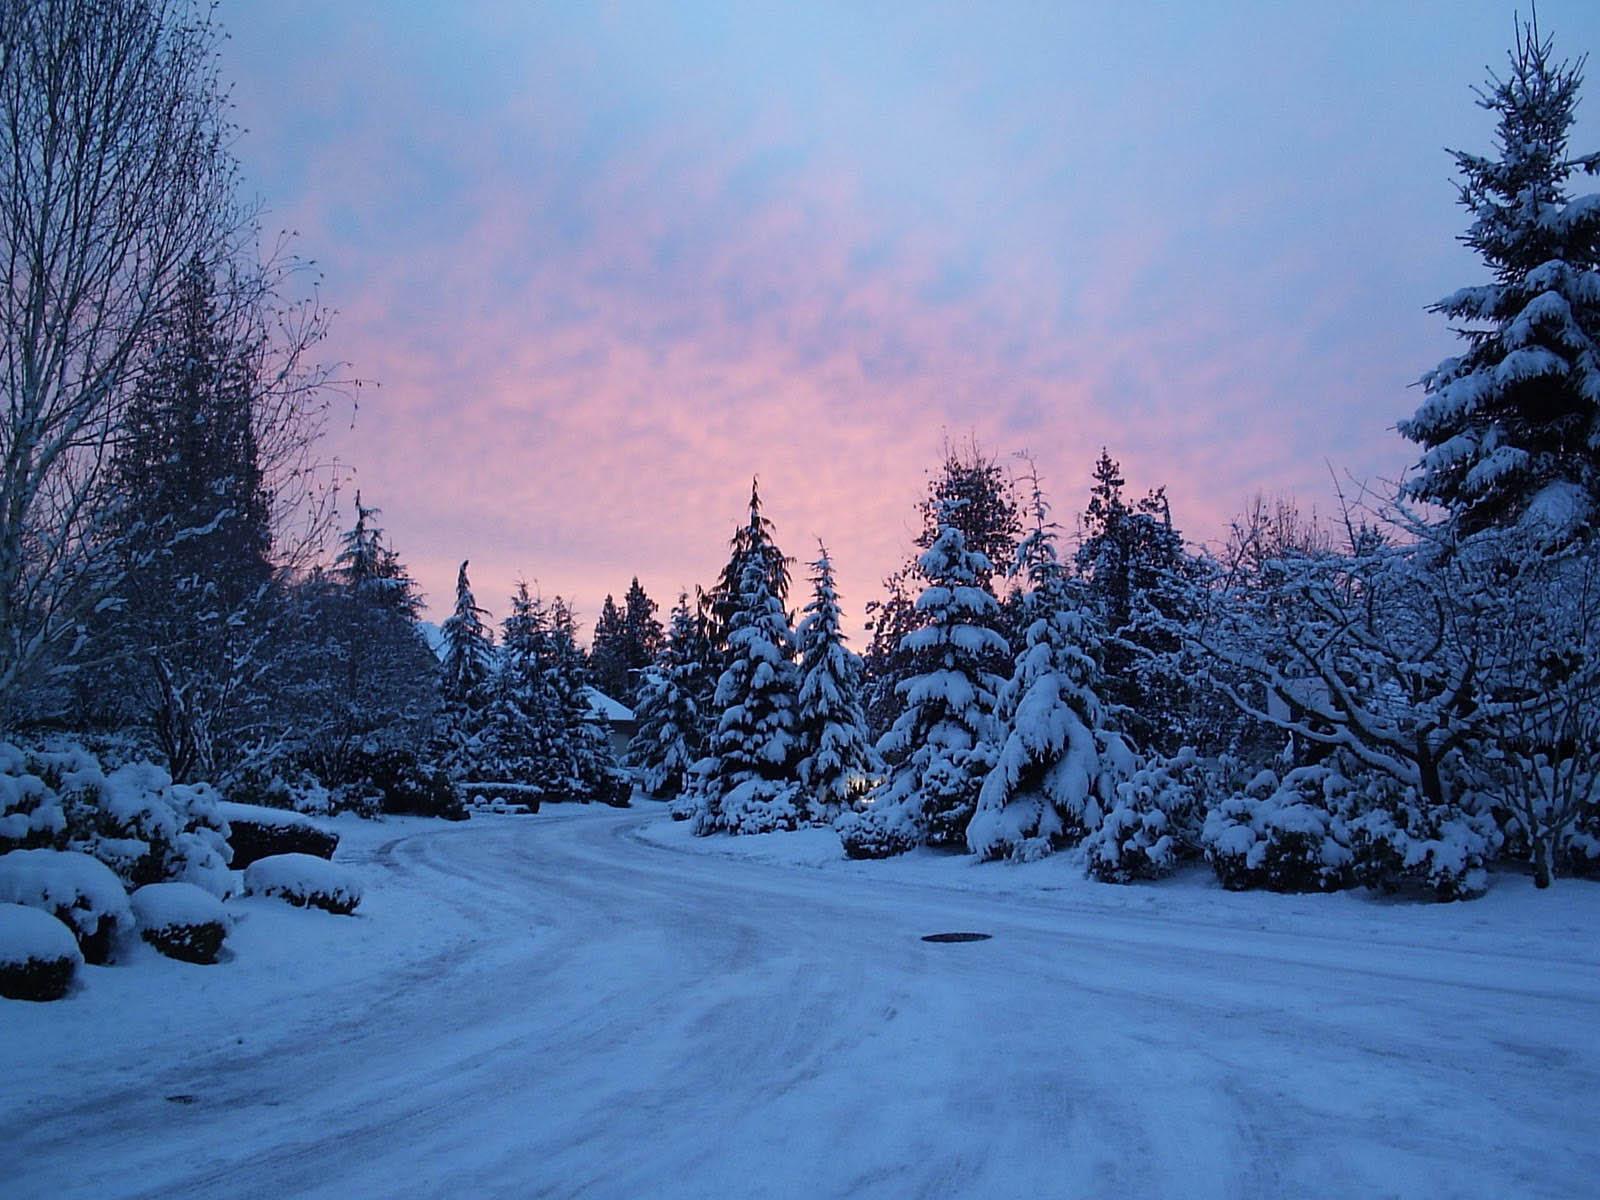 Wallpapers Winter Desktop Backgrounds Winter Photos Winter 1600x1200